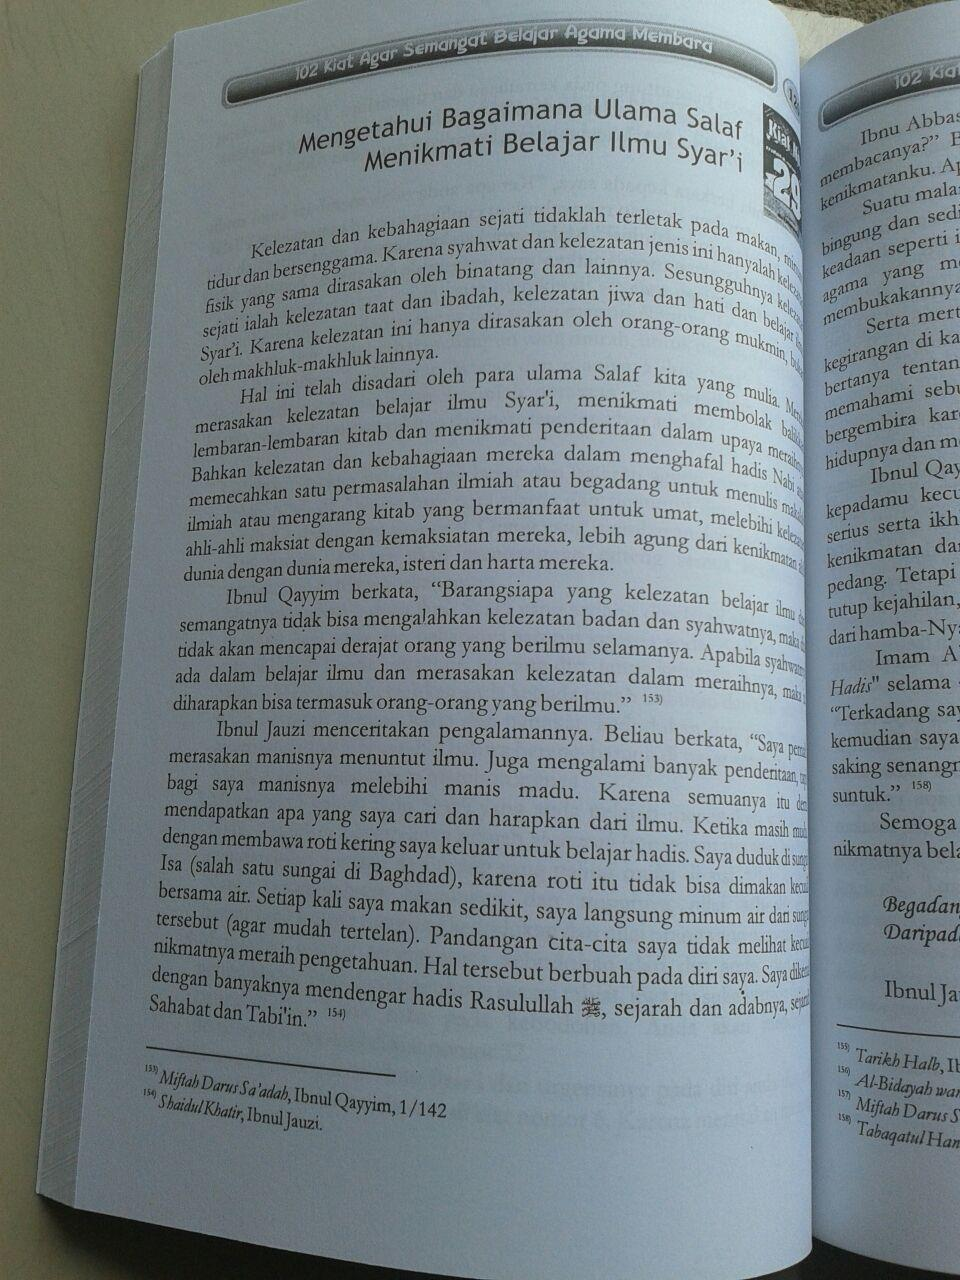 Buku 102 Kiat Agar Semangat Belajar Agama Membara isi 3